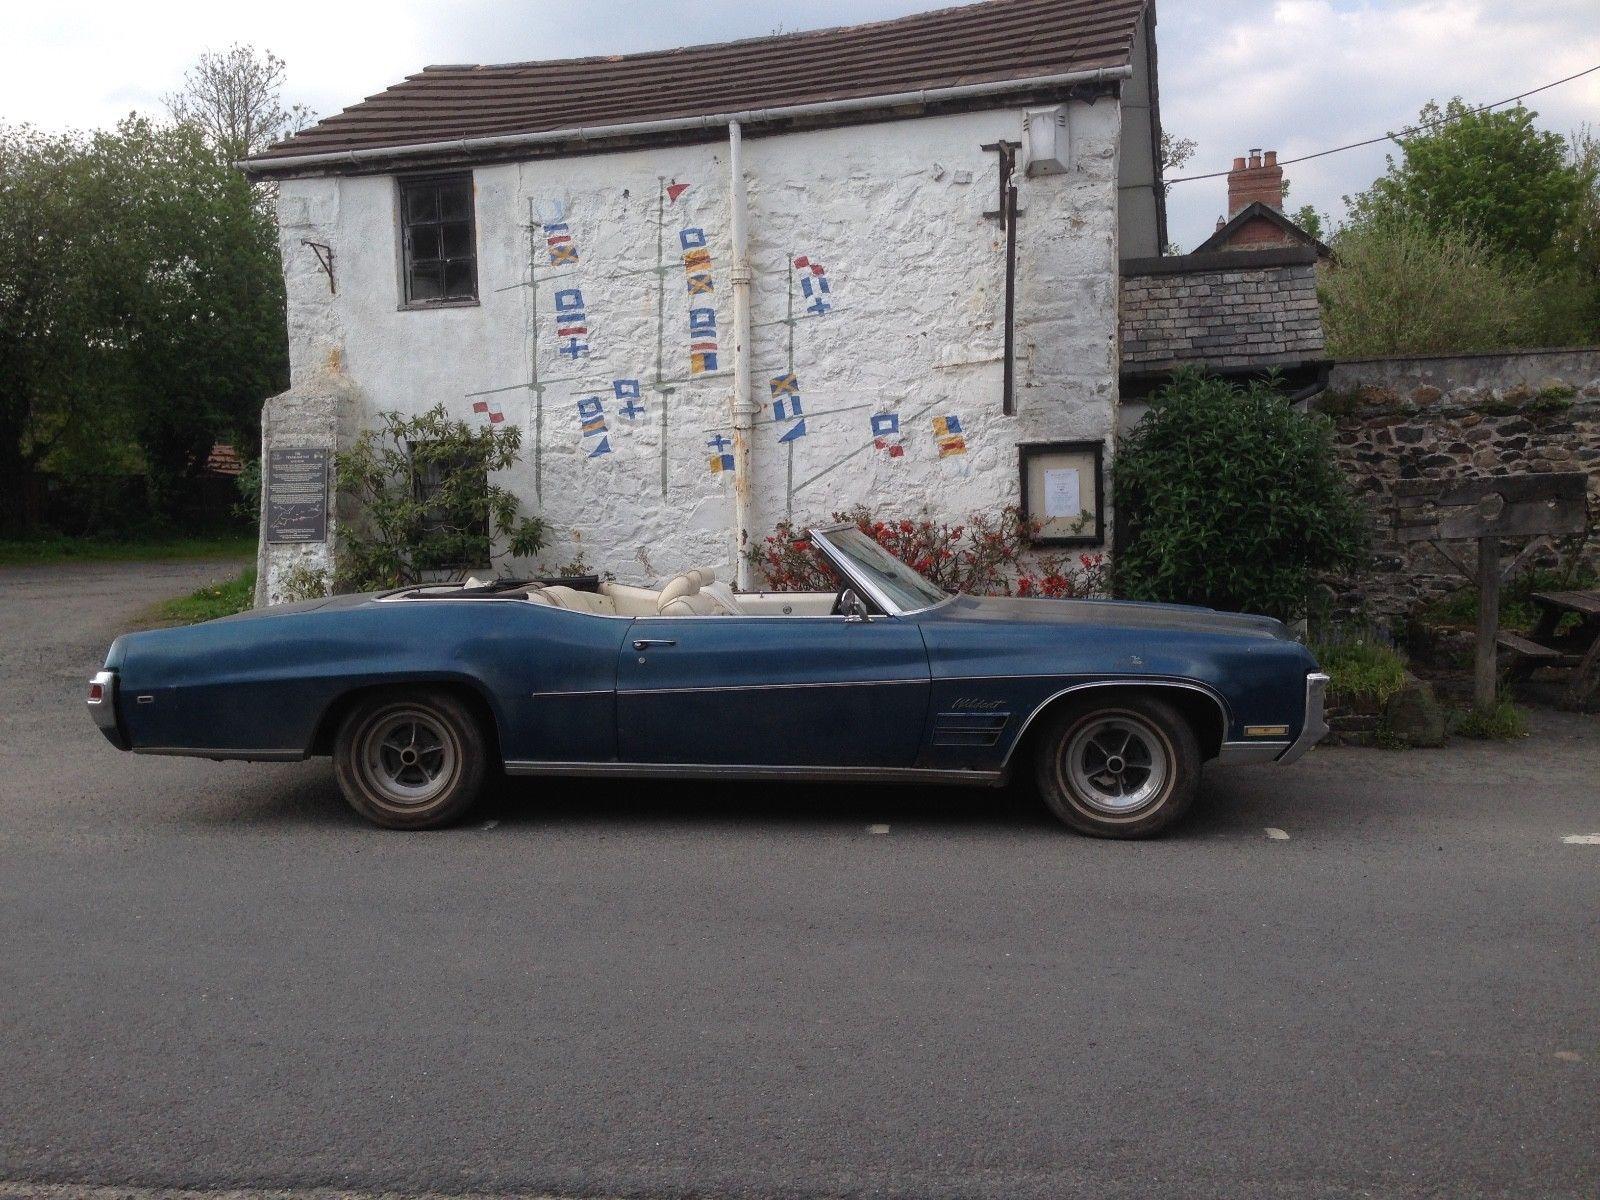 1970 Buick Wildcat convertible mot uk regd on the road